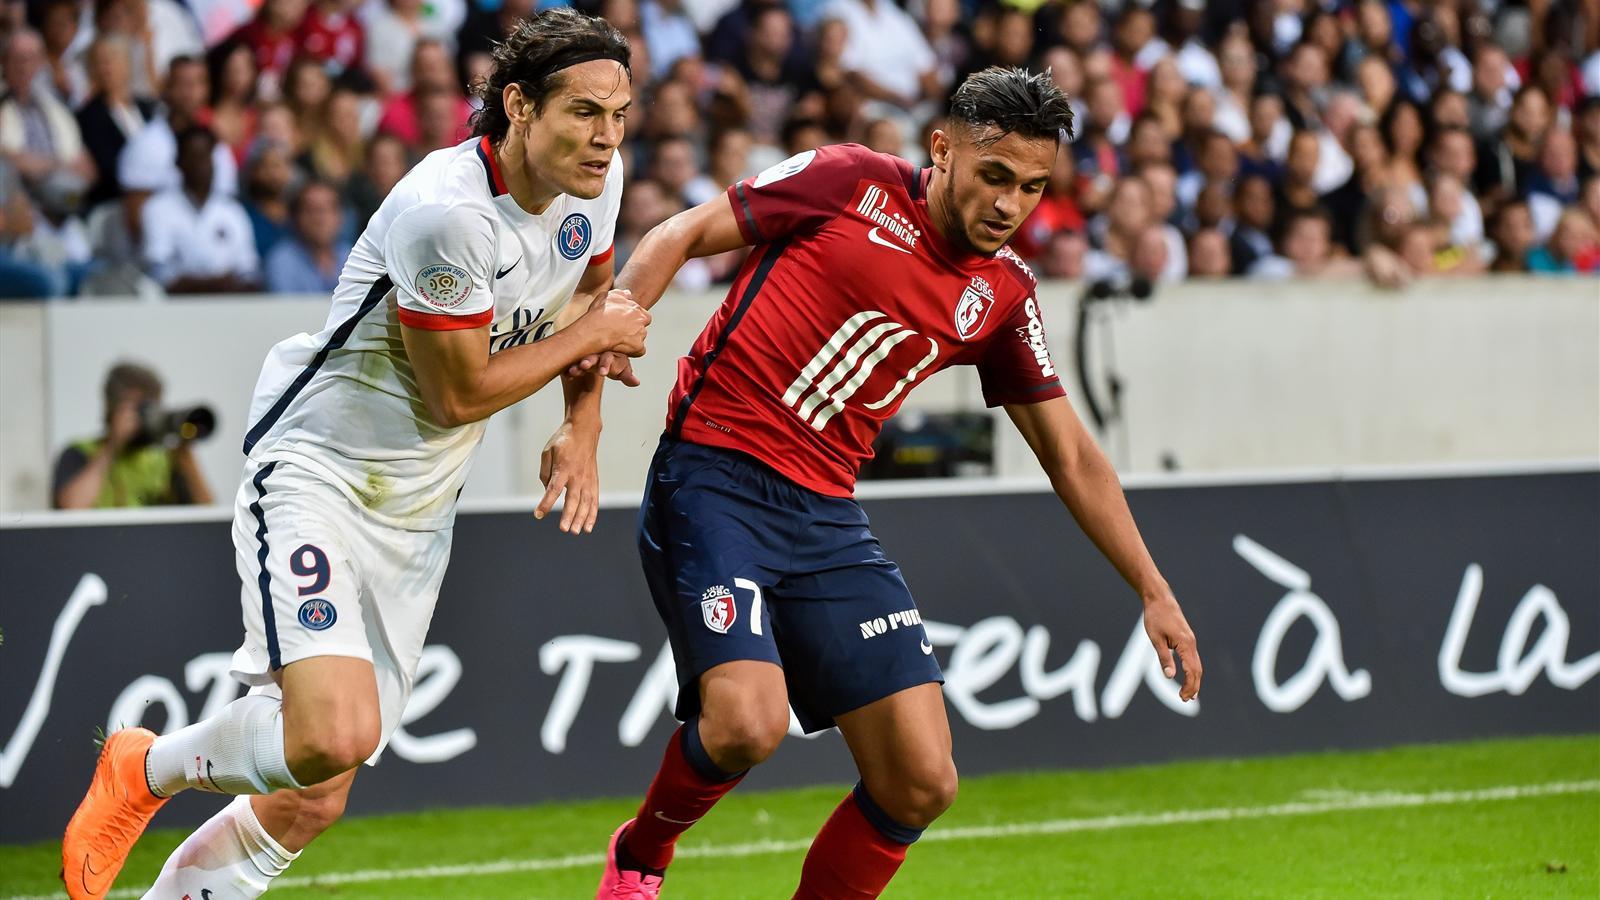 Cavani Boufal - Lille vs PSG - Ligue 1 2015/2016